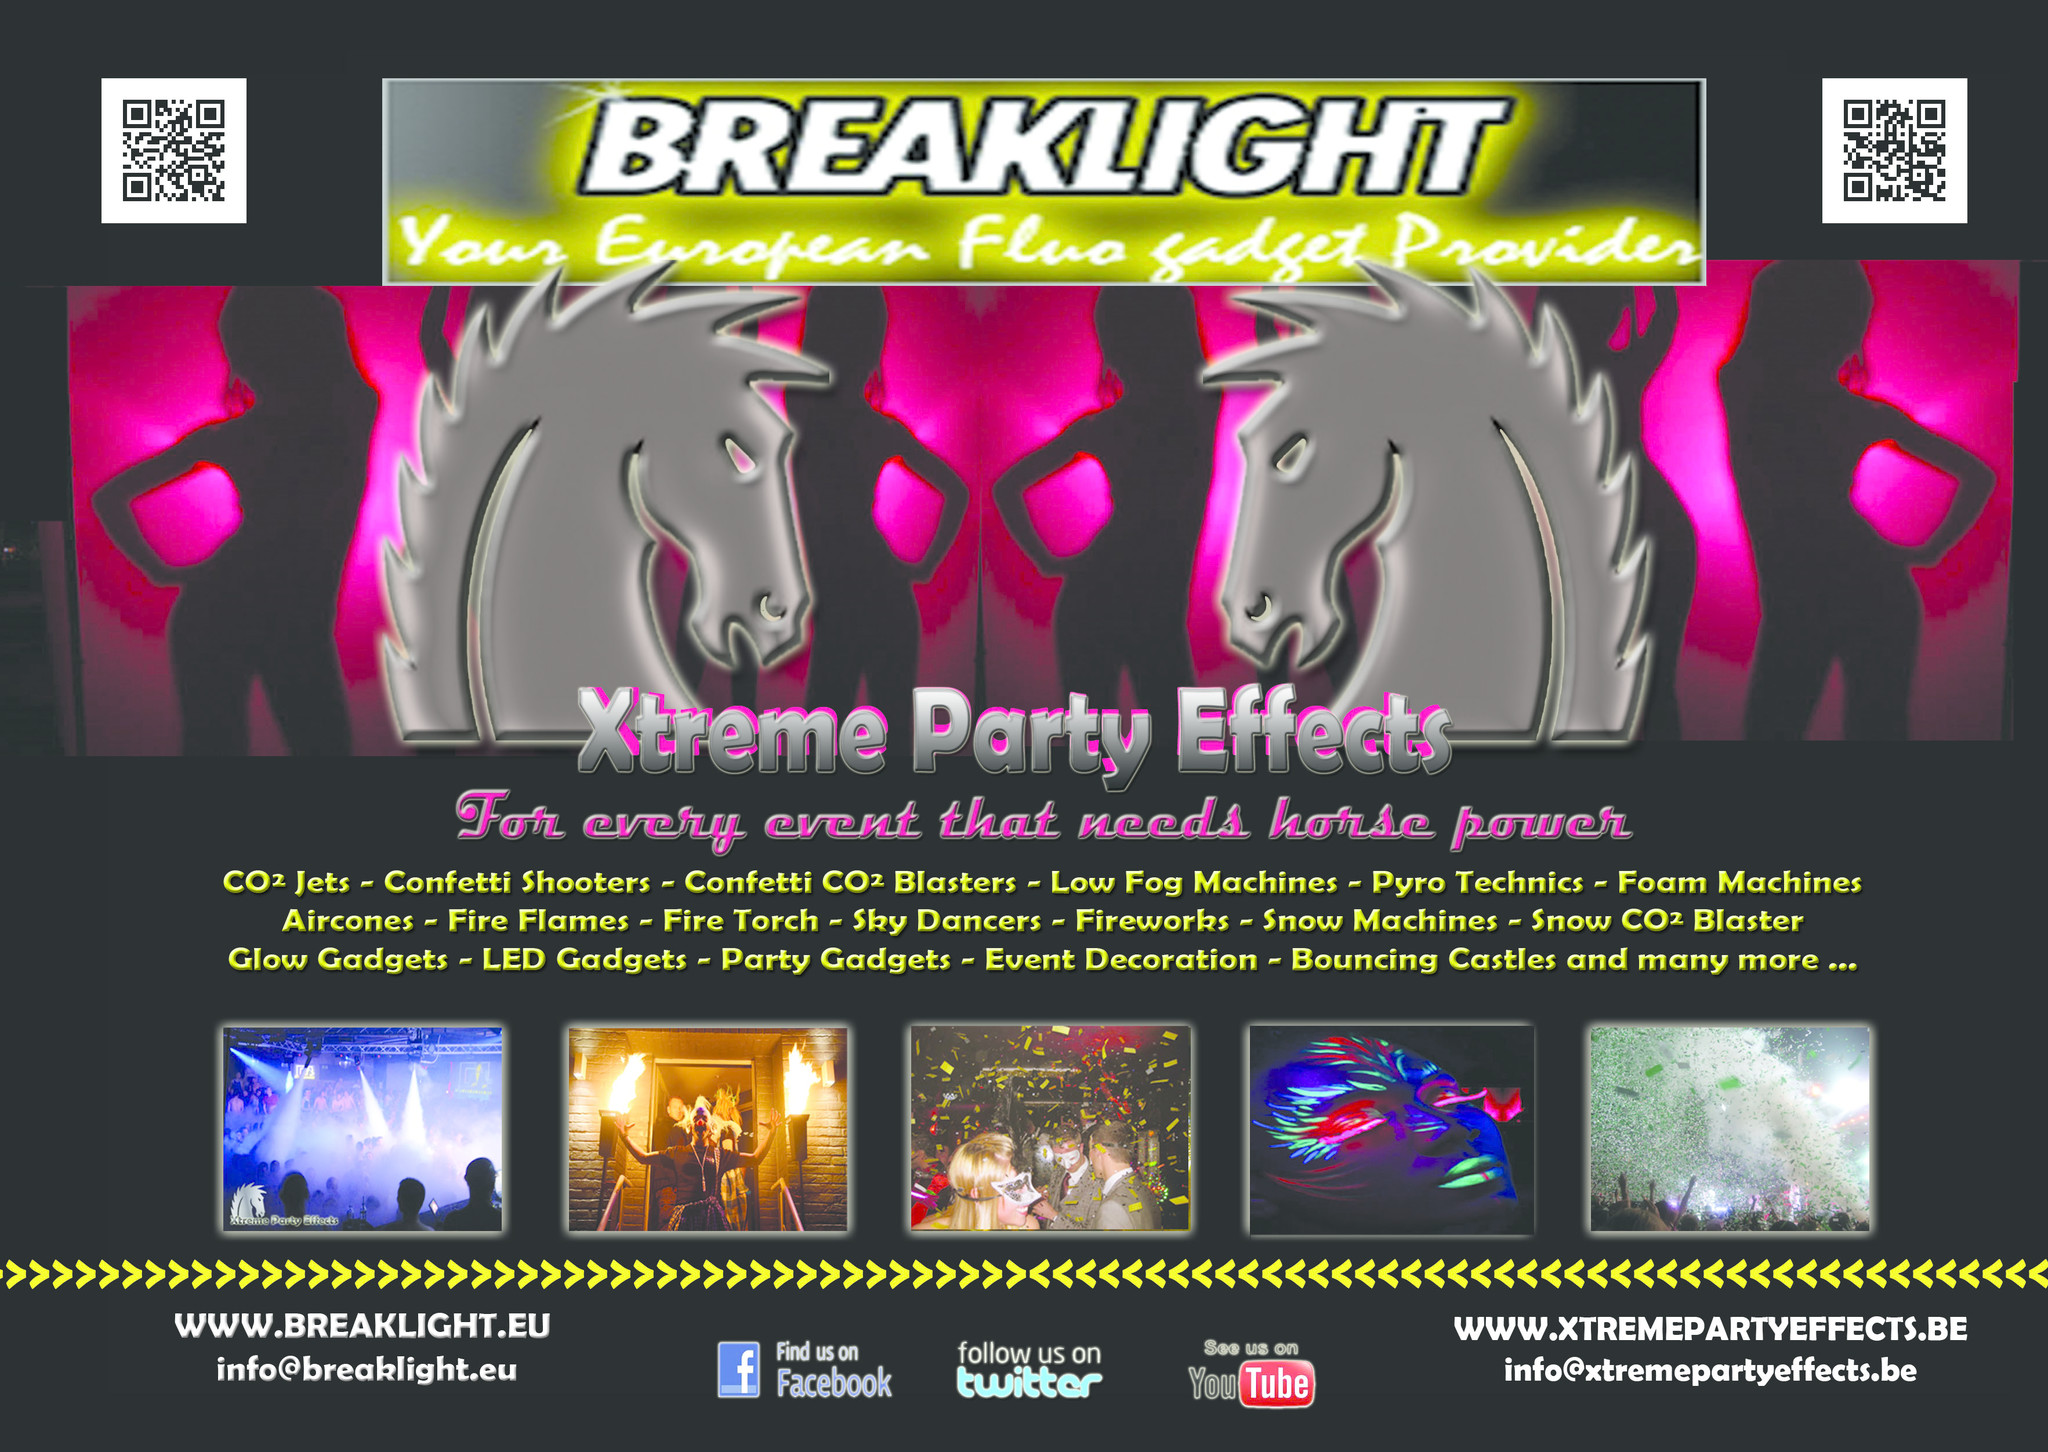 Breaklight Belgium